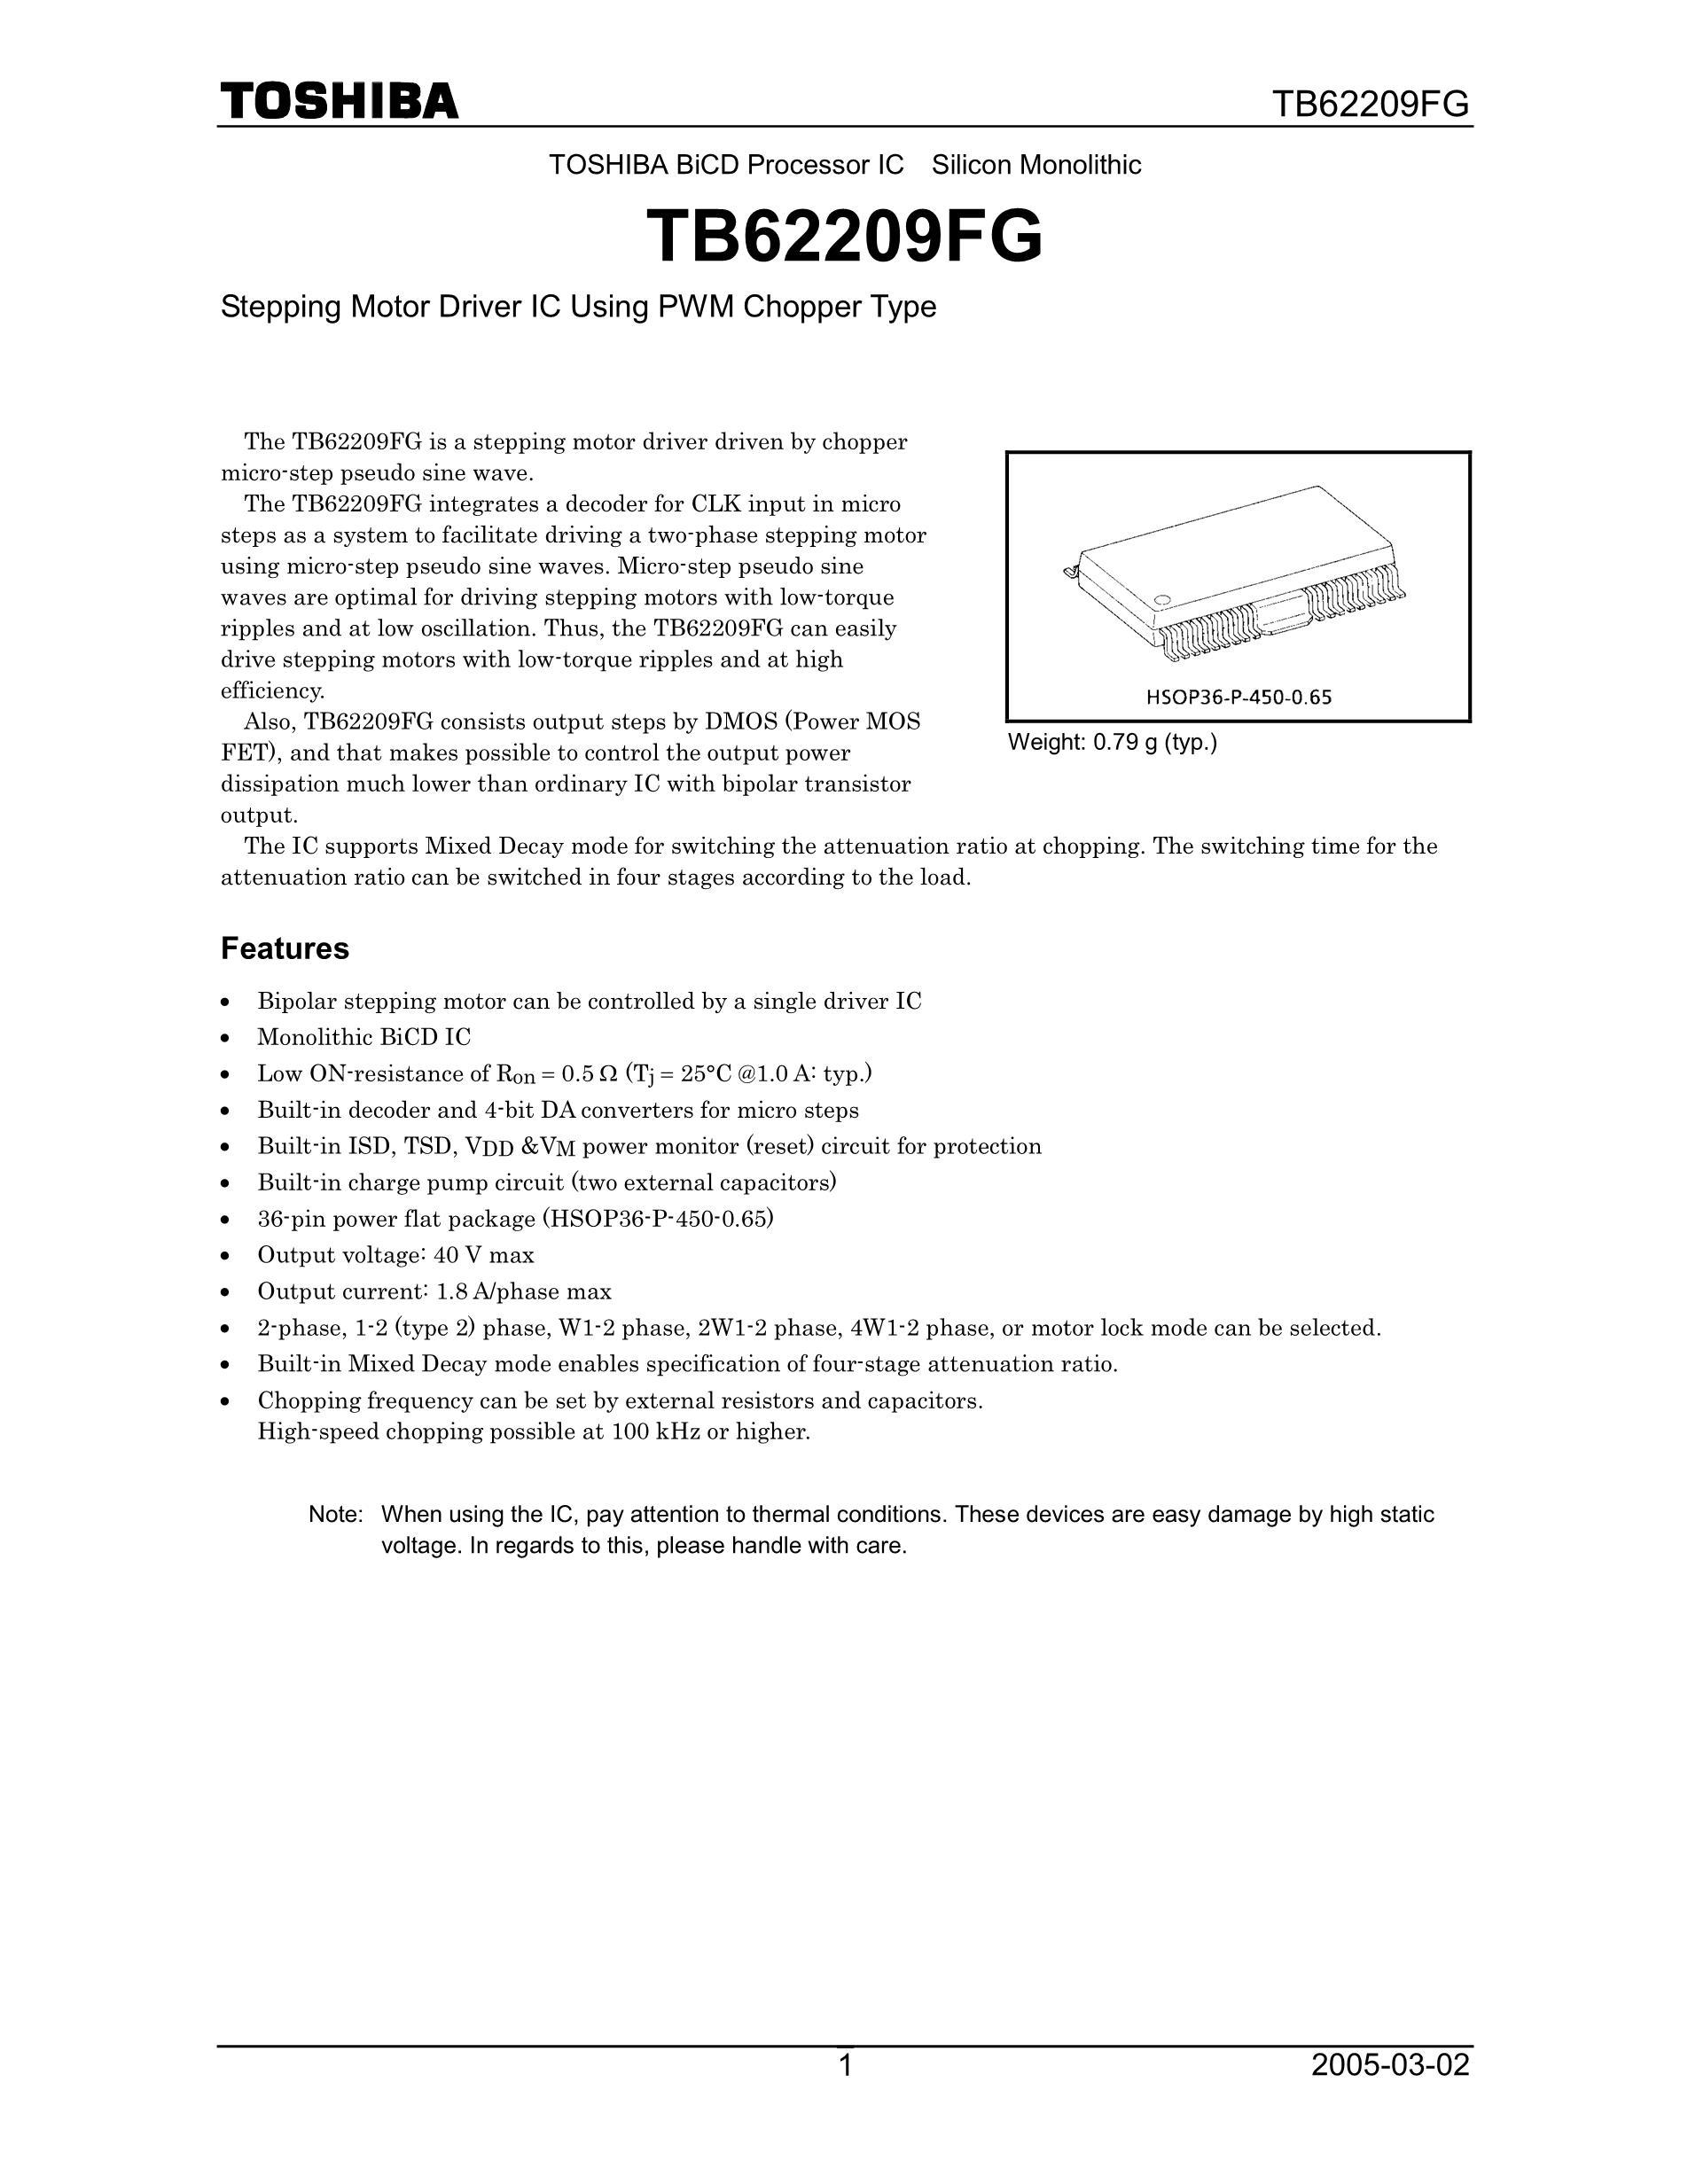 TB62214AFTG(O,8,EL's pdf picture 1